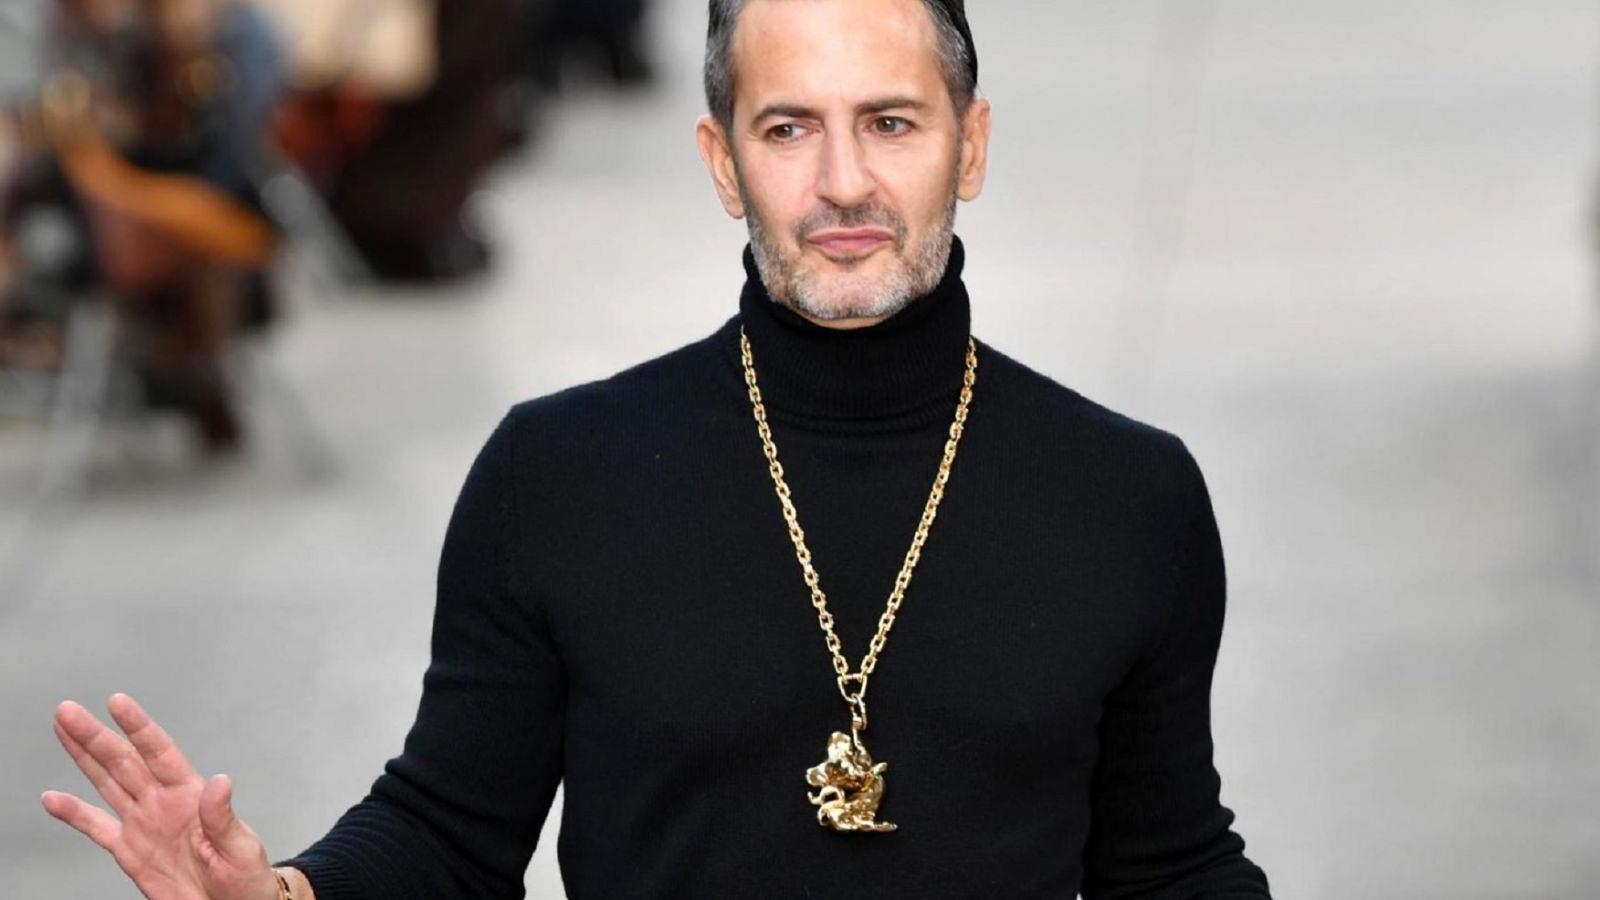 Marc Jacobs: Ένα σπασμένο τζάμι δεν μπορεί να τον κάνει να σωπάσει – «Βία είναι ο ρατσισμός»